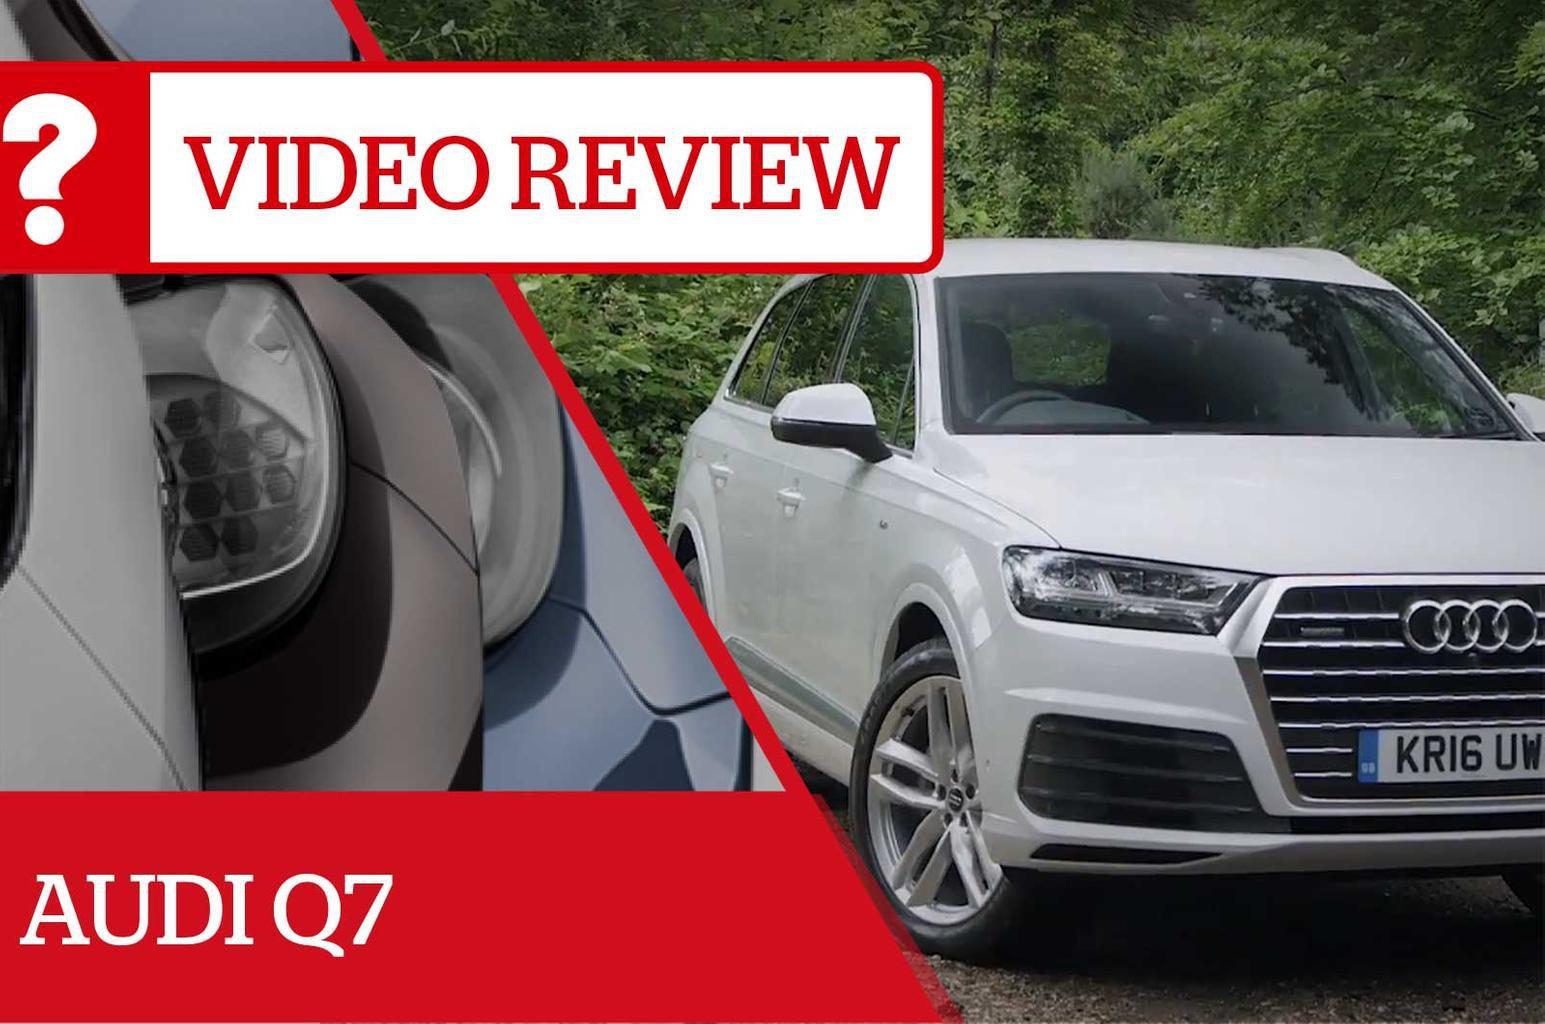 Video: Audi Q7 review